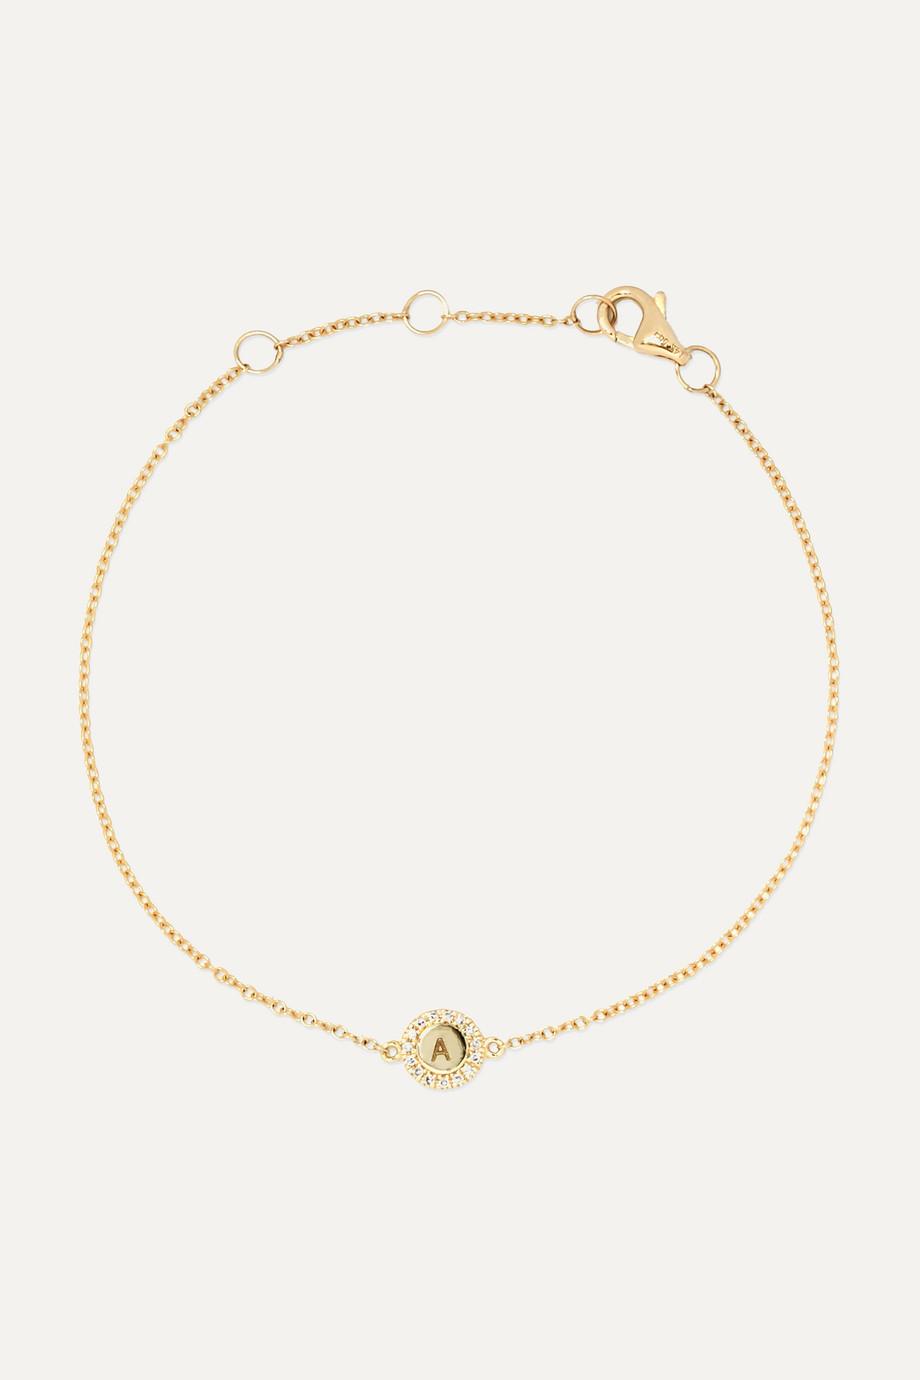 STONE AND STRAND Alphabet Armband aus 14 Karat Gold mit Diamanten